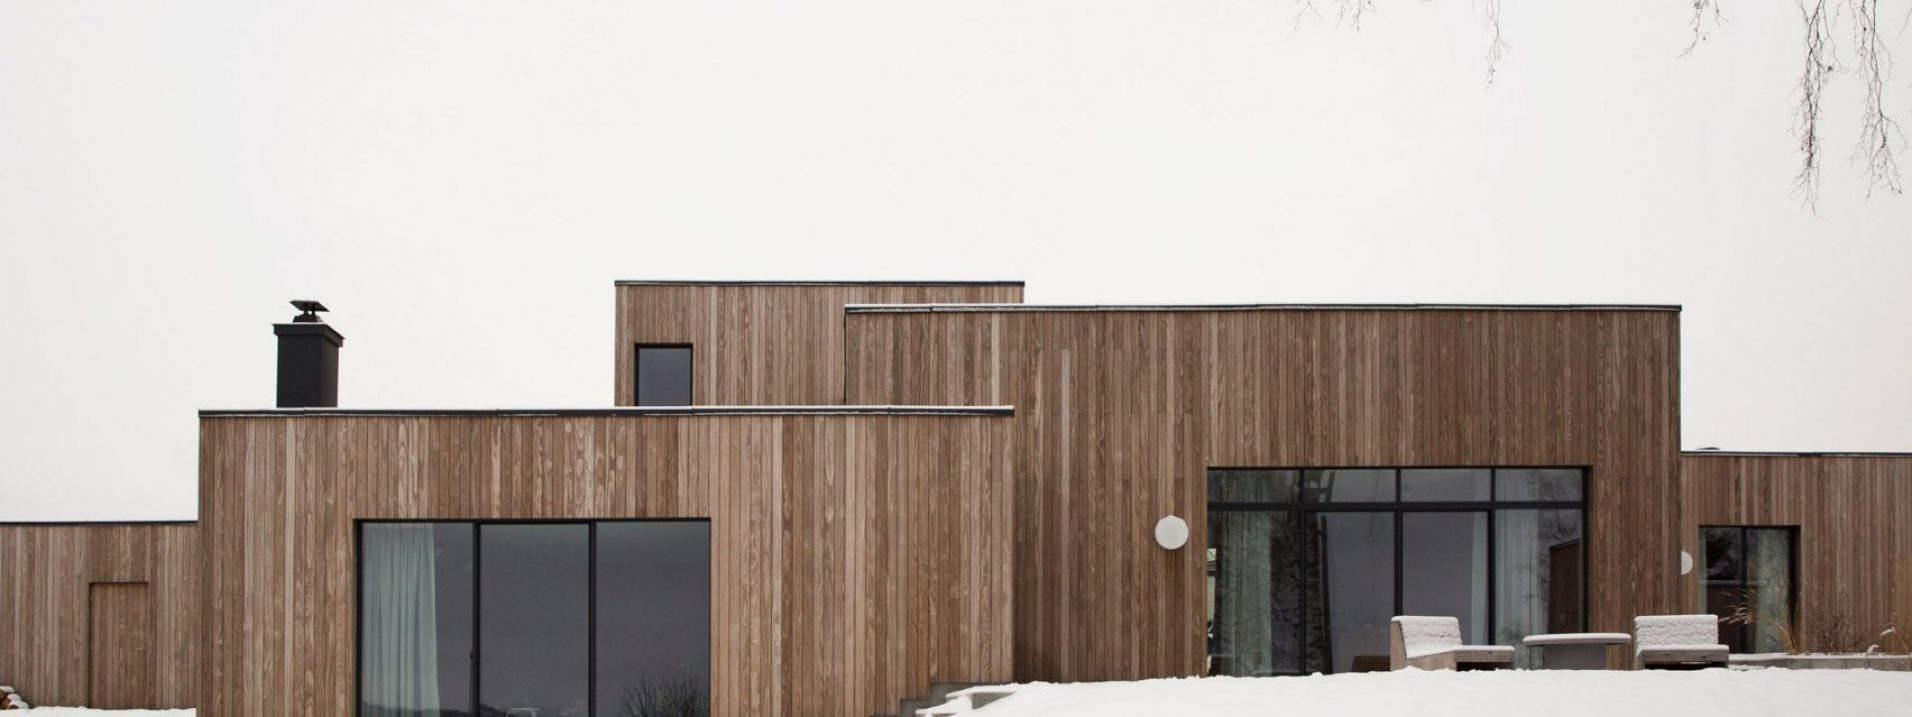 husinspiration, dezeen, norm architects